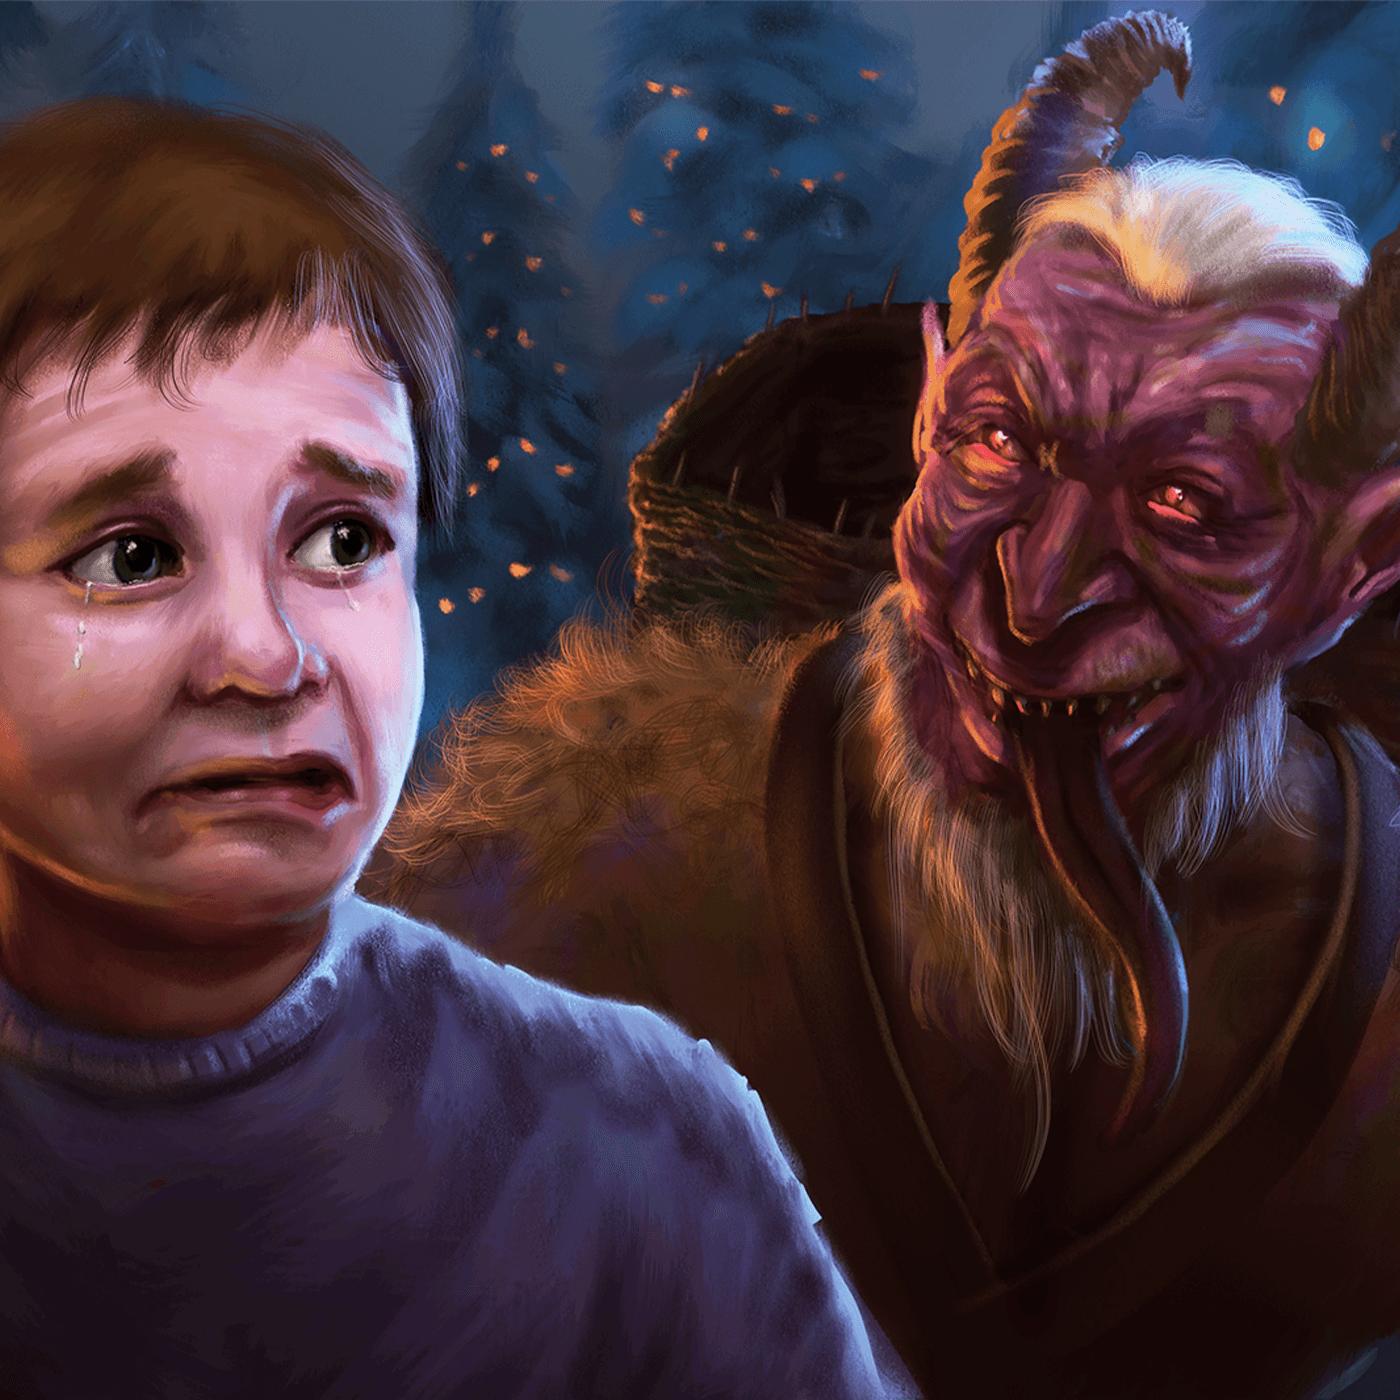 Episode 10: Krampus: Exploring the Legend of the Christmas Demon